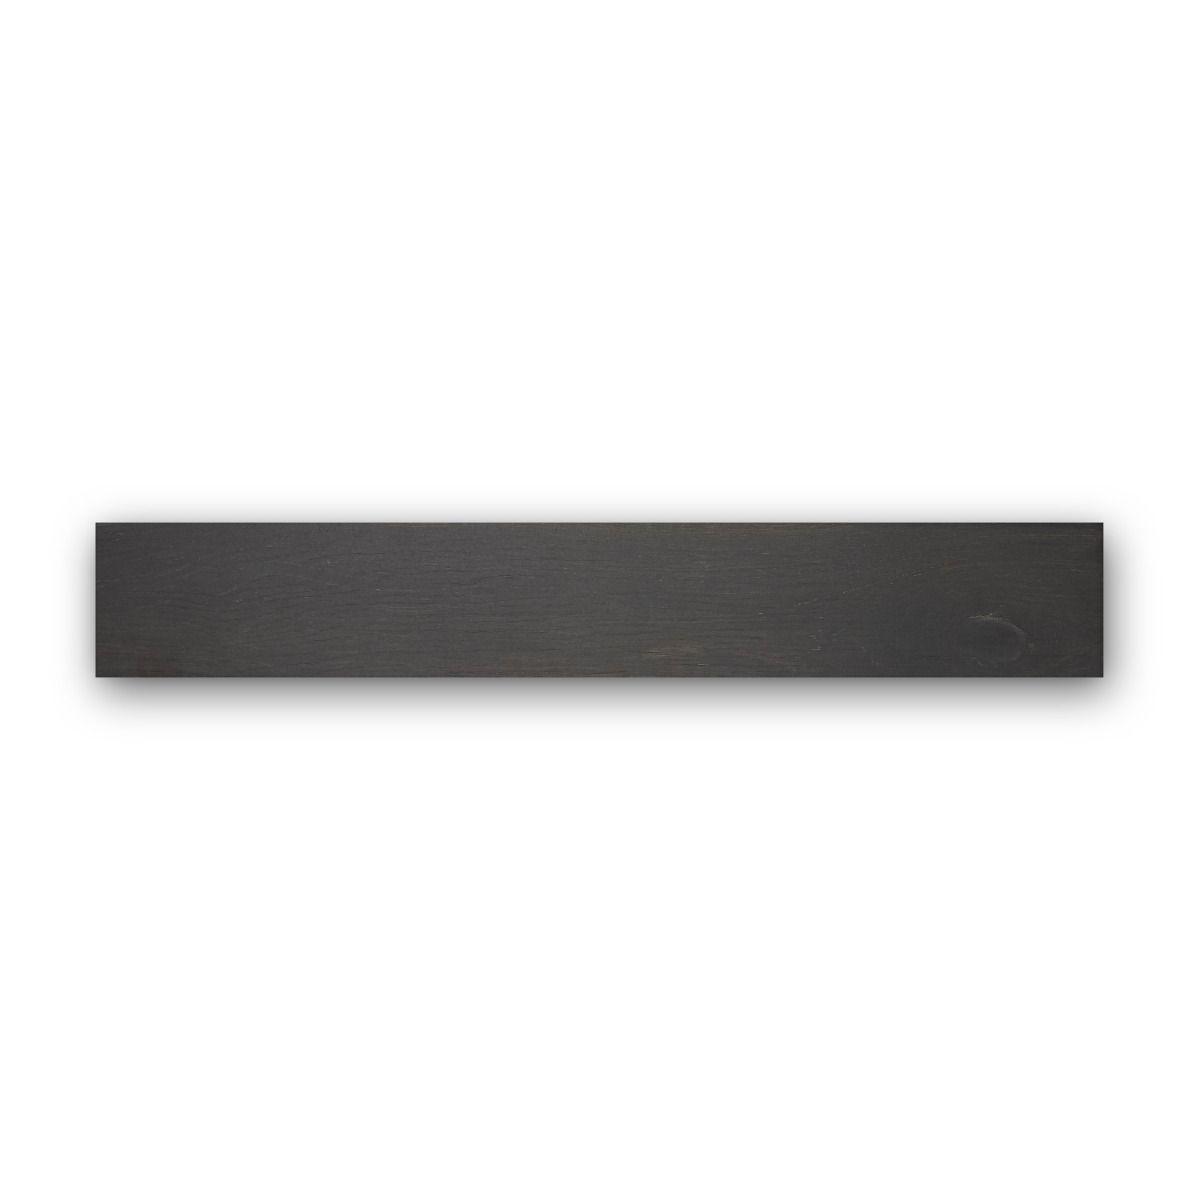 Sherwood Black 20x120